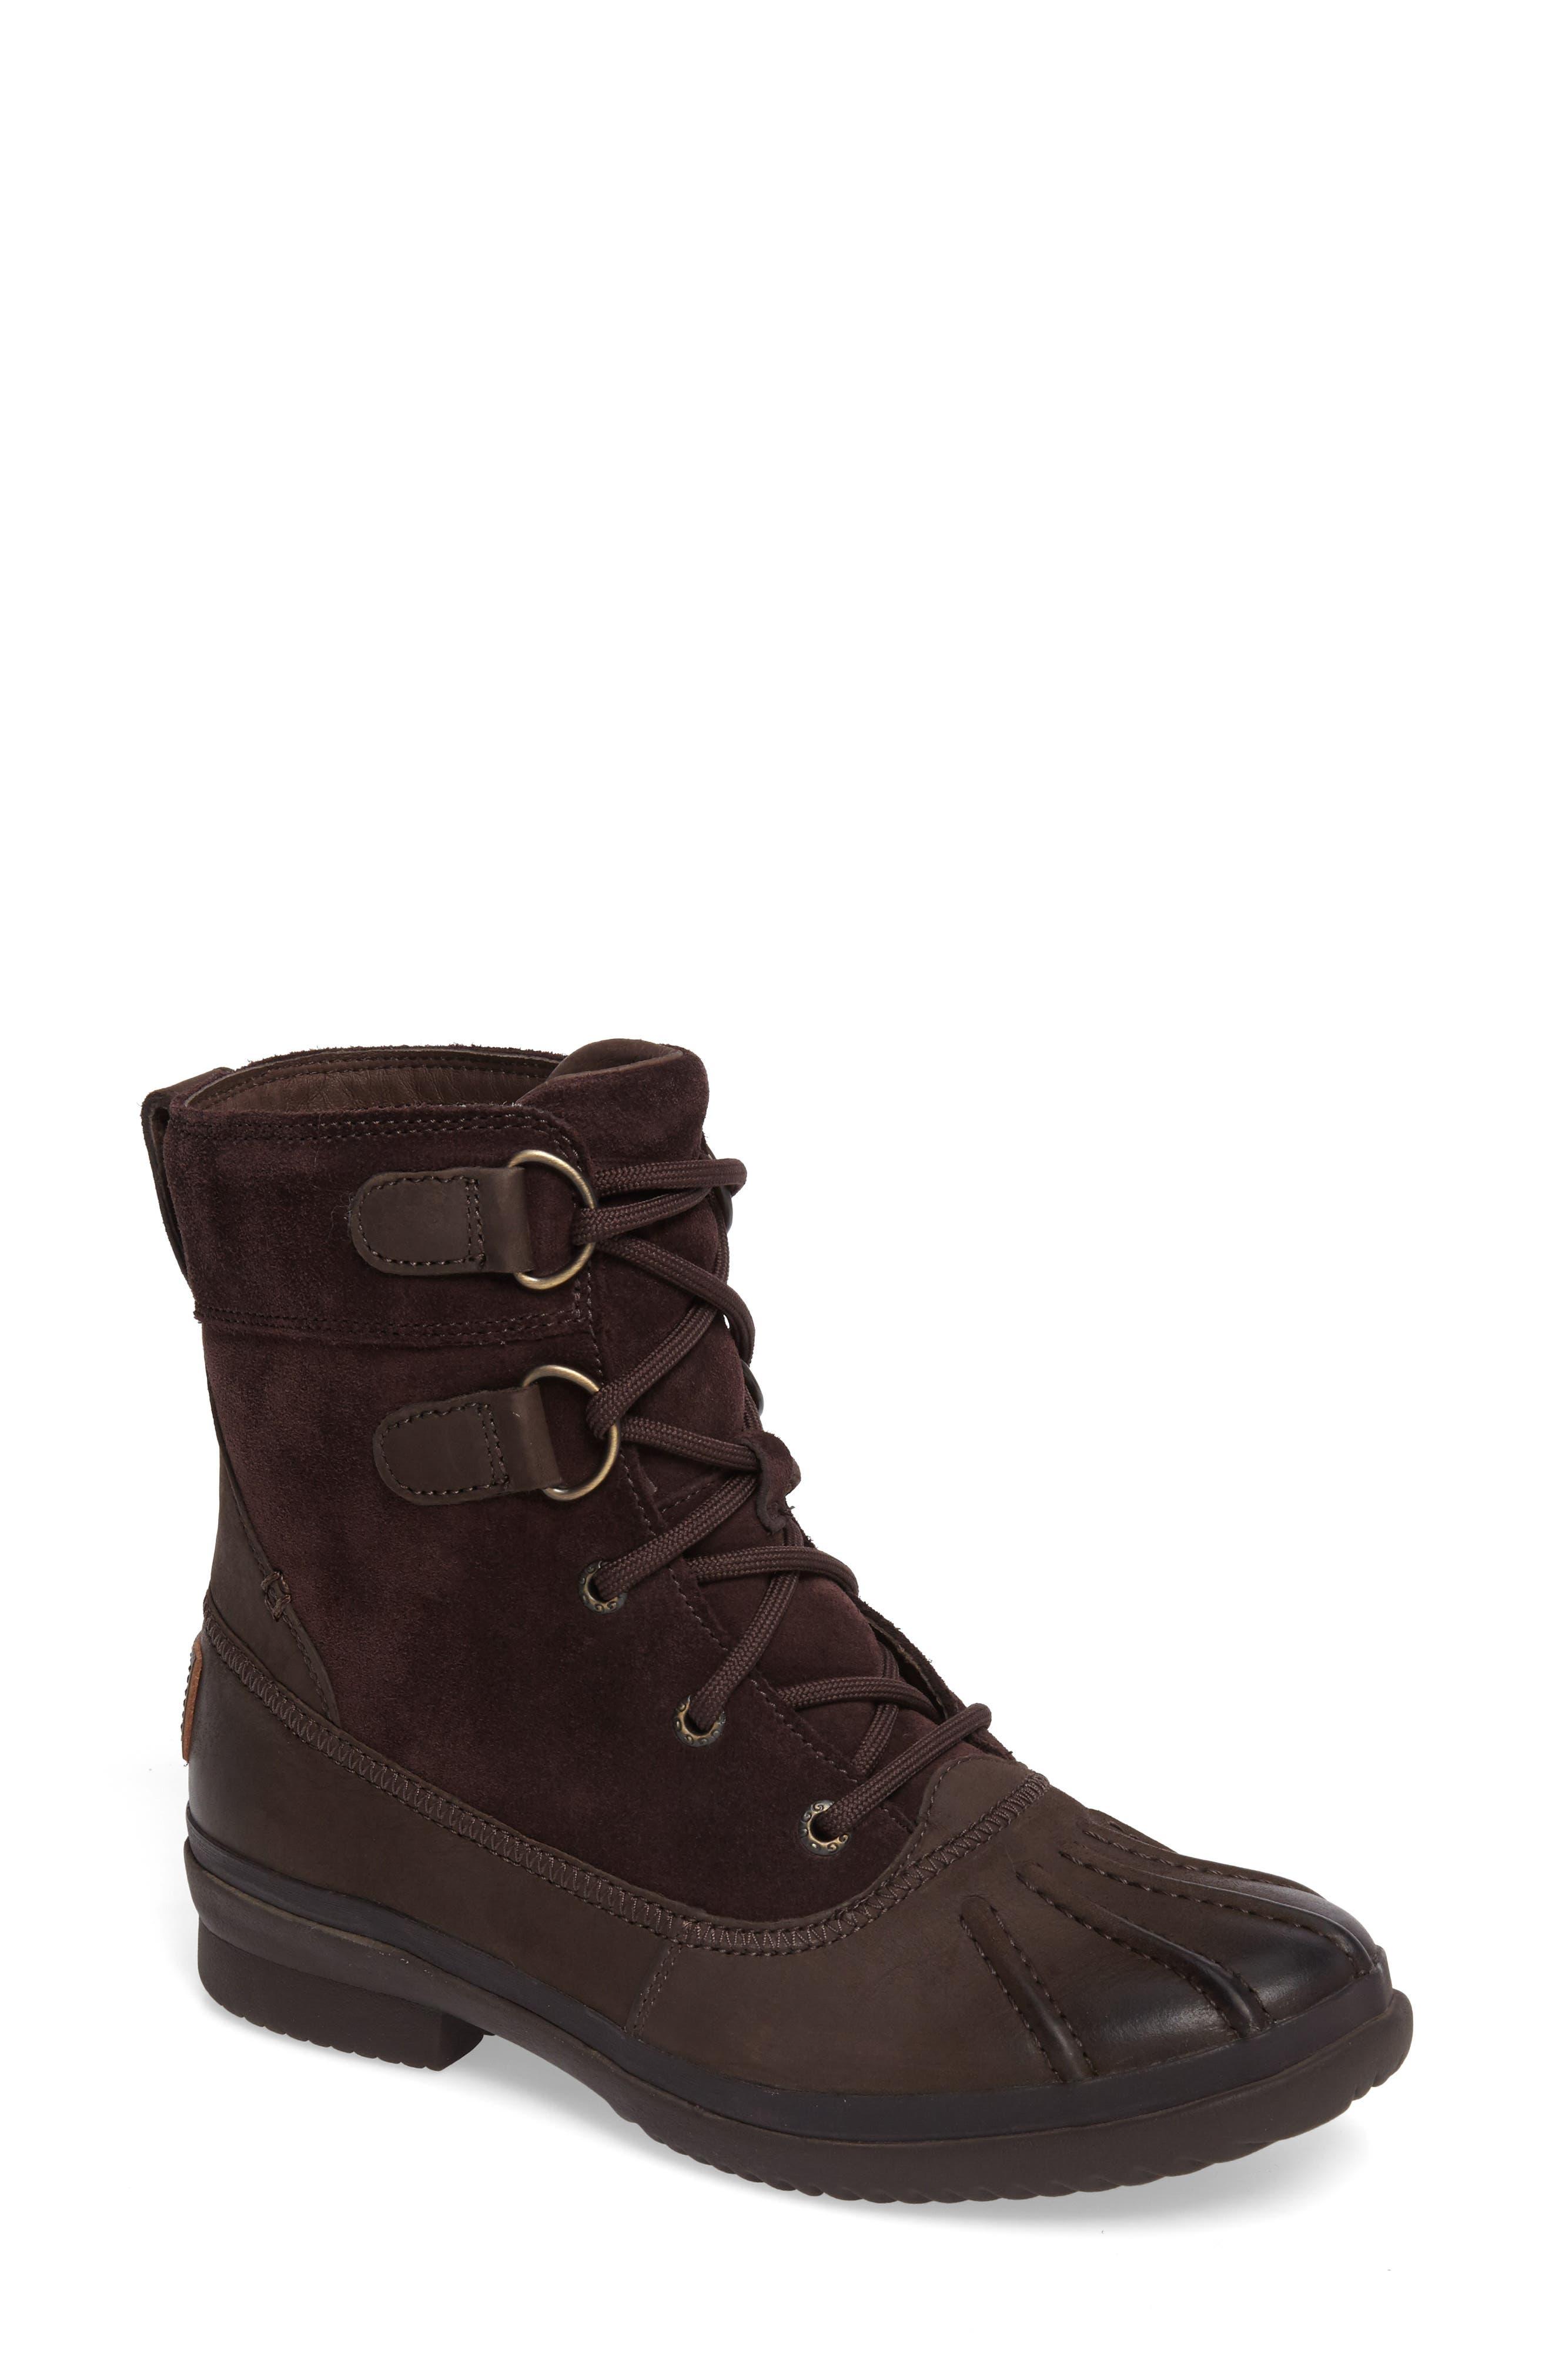 Alternate Image 1 Selected - UGG® Azaria Waterproof Boot (Women)